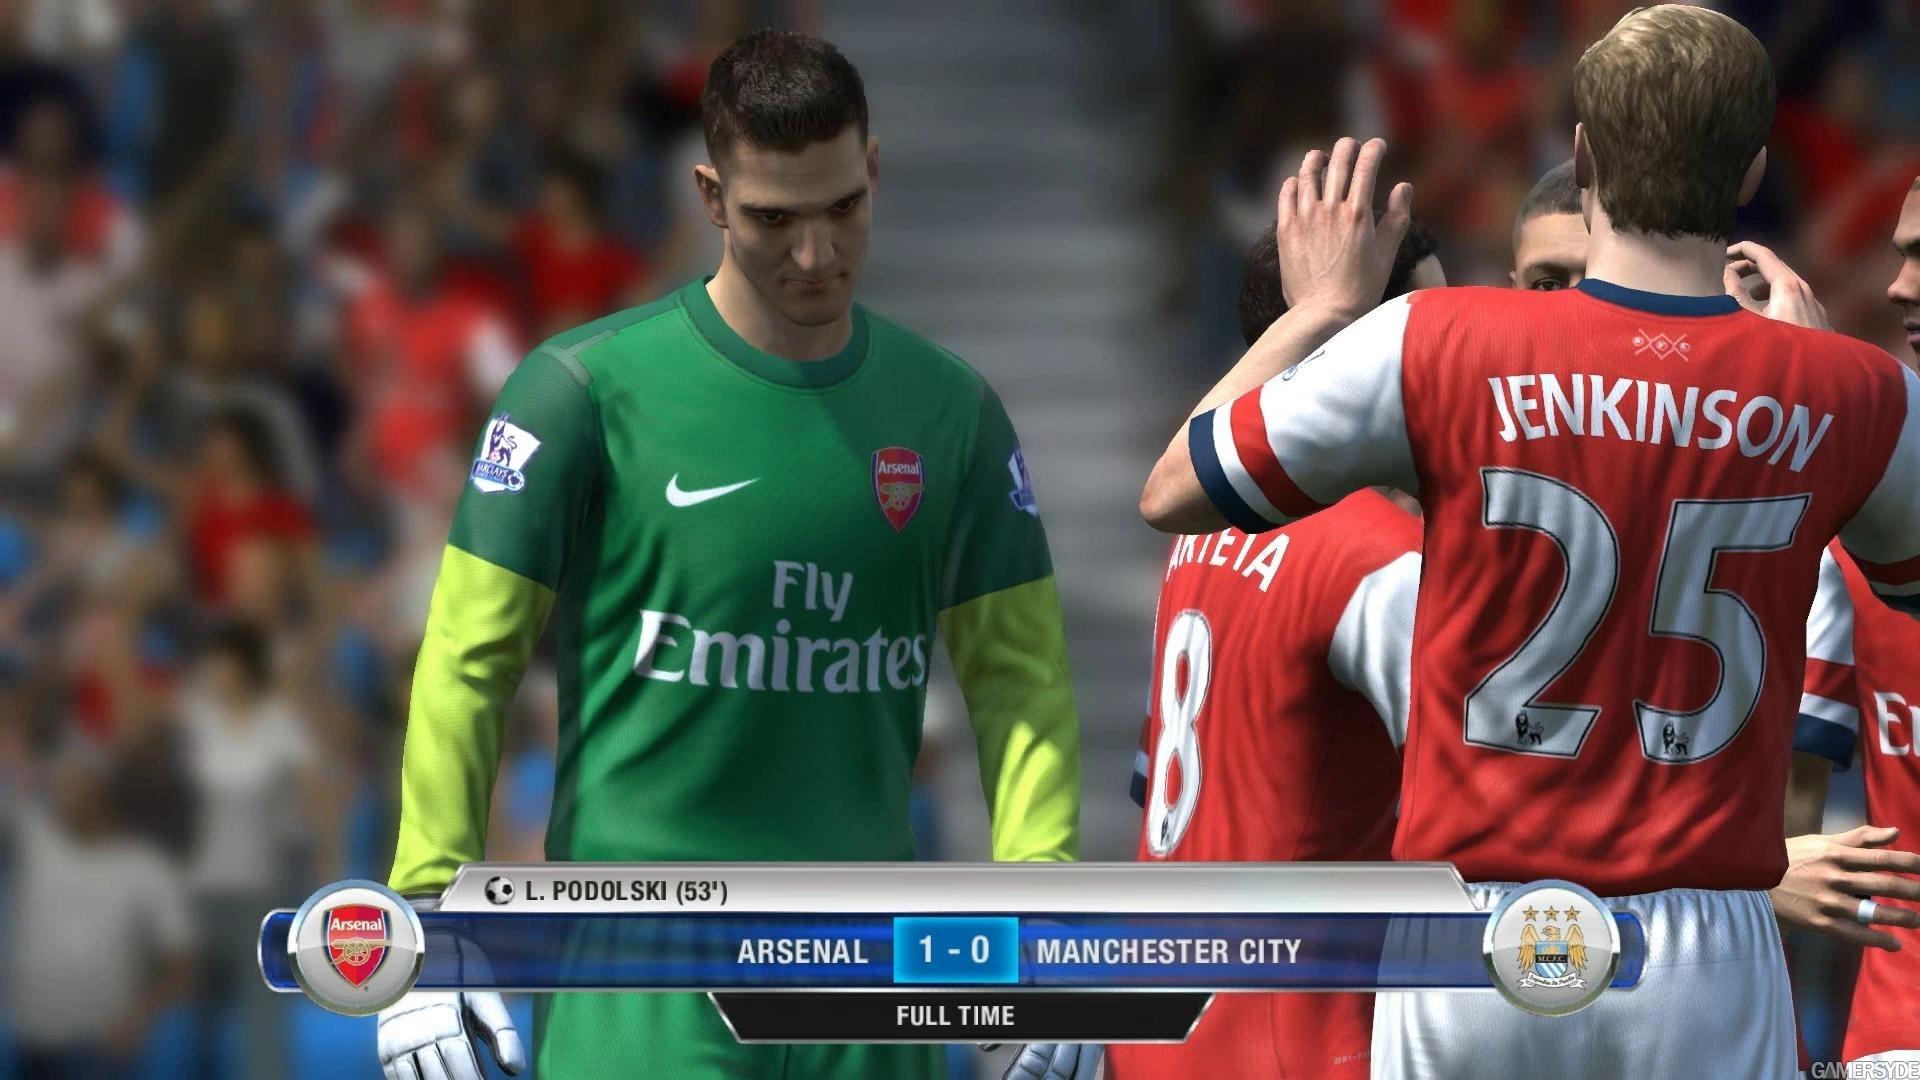 image fifa 13 20263 2509 0010 تصاویر جدید از بازی FIFA 13